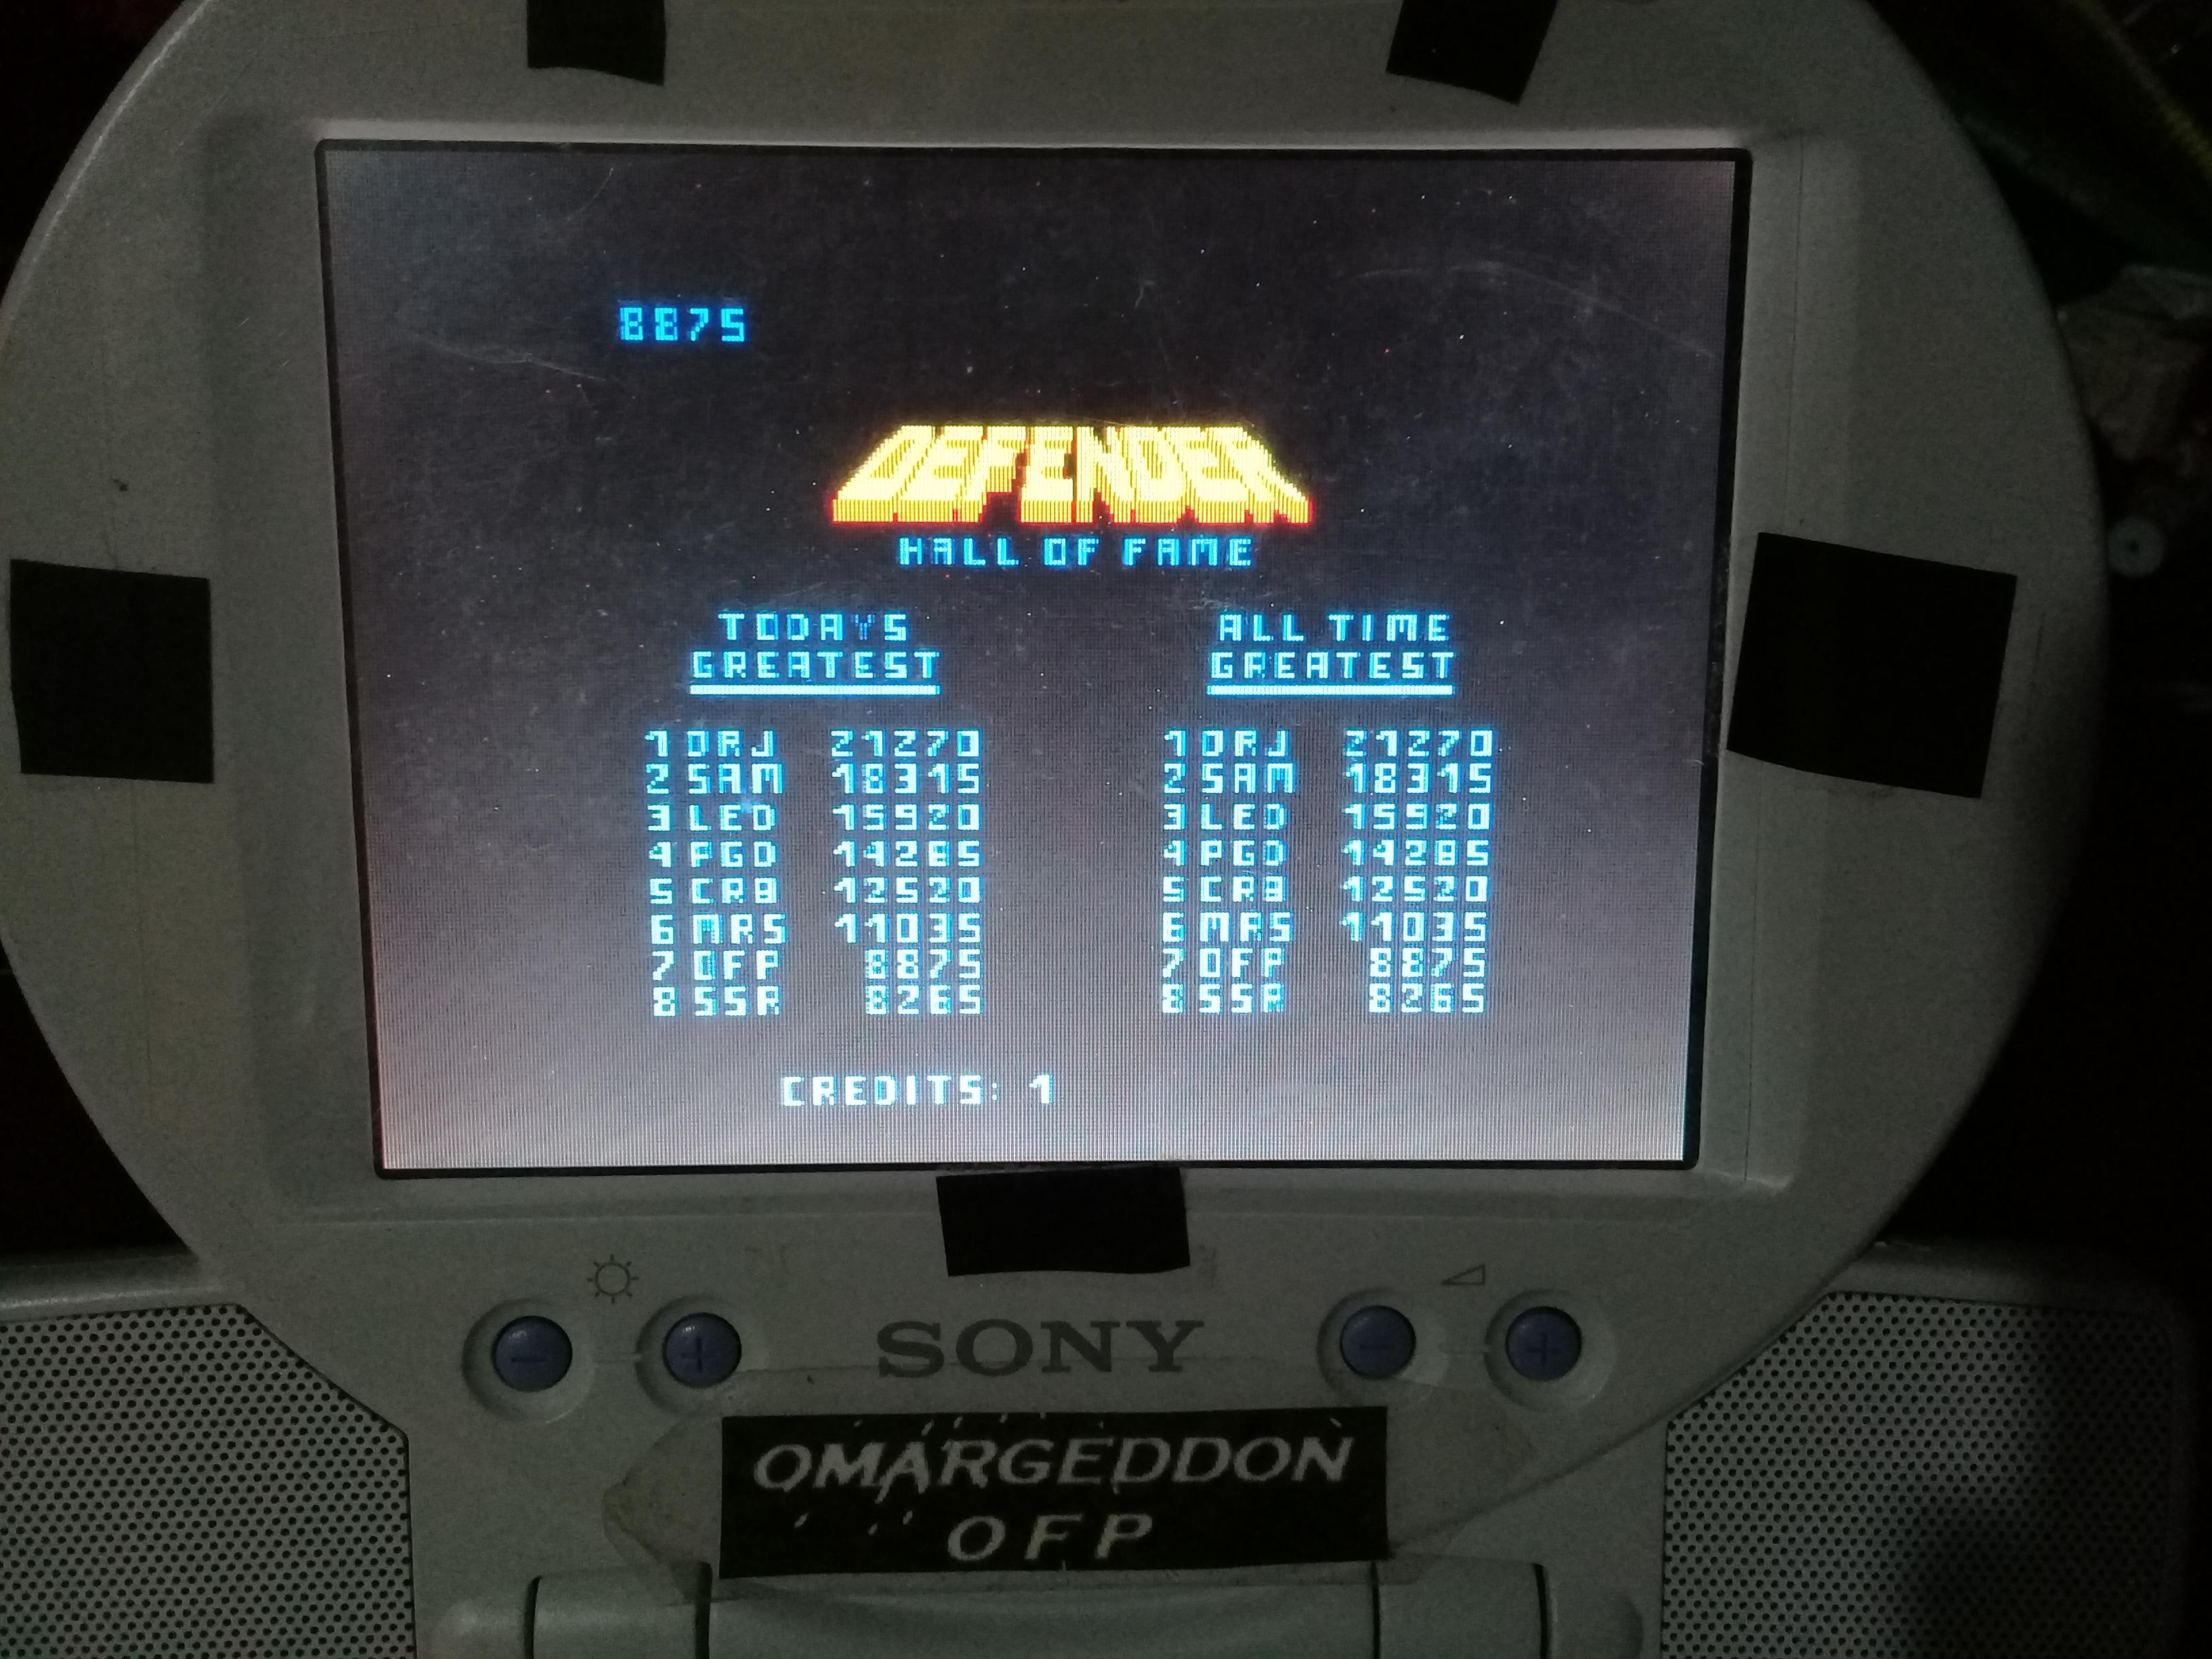 omargeddon: Williams Arcade